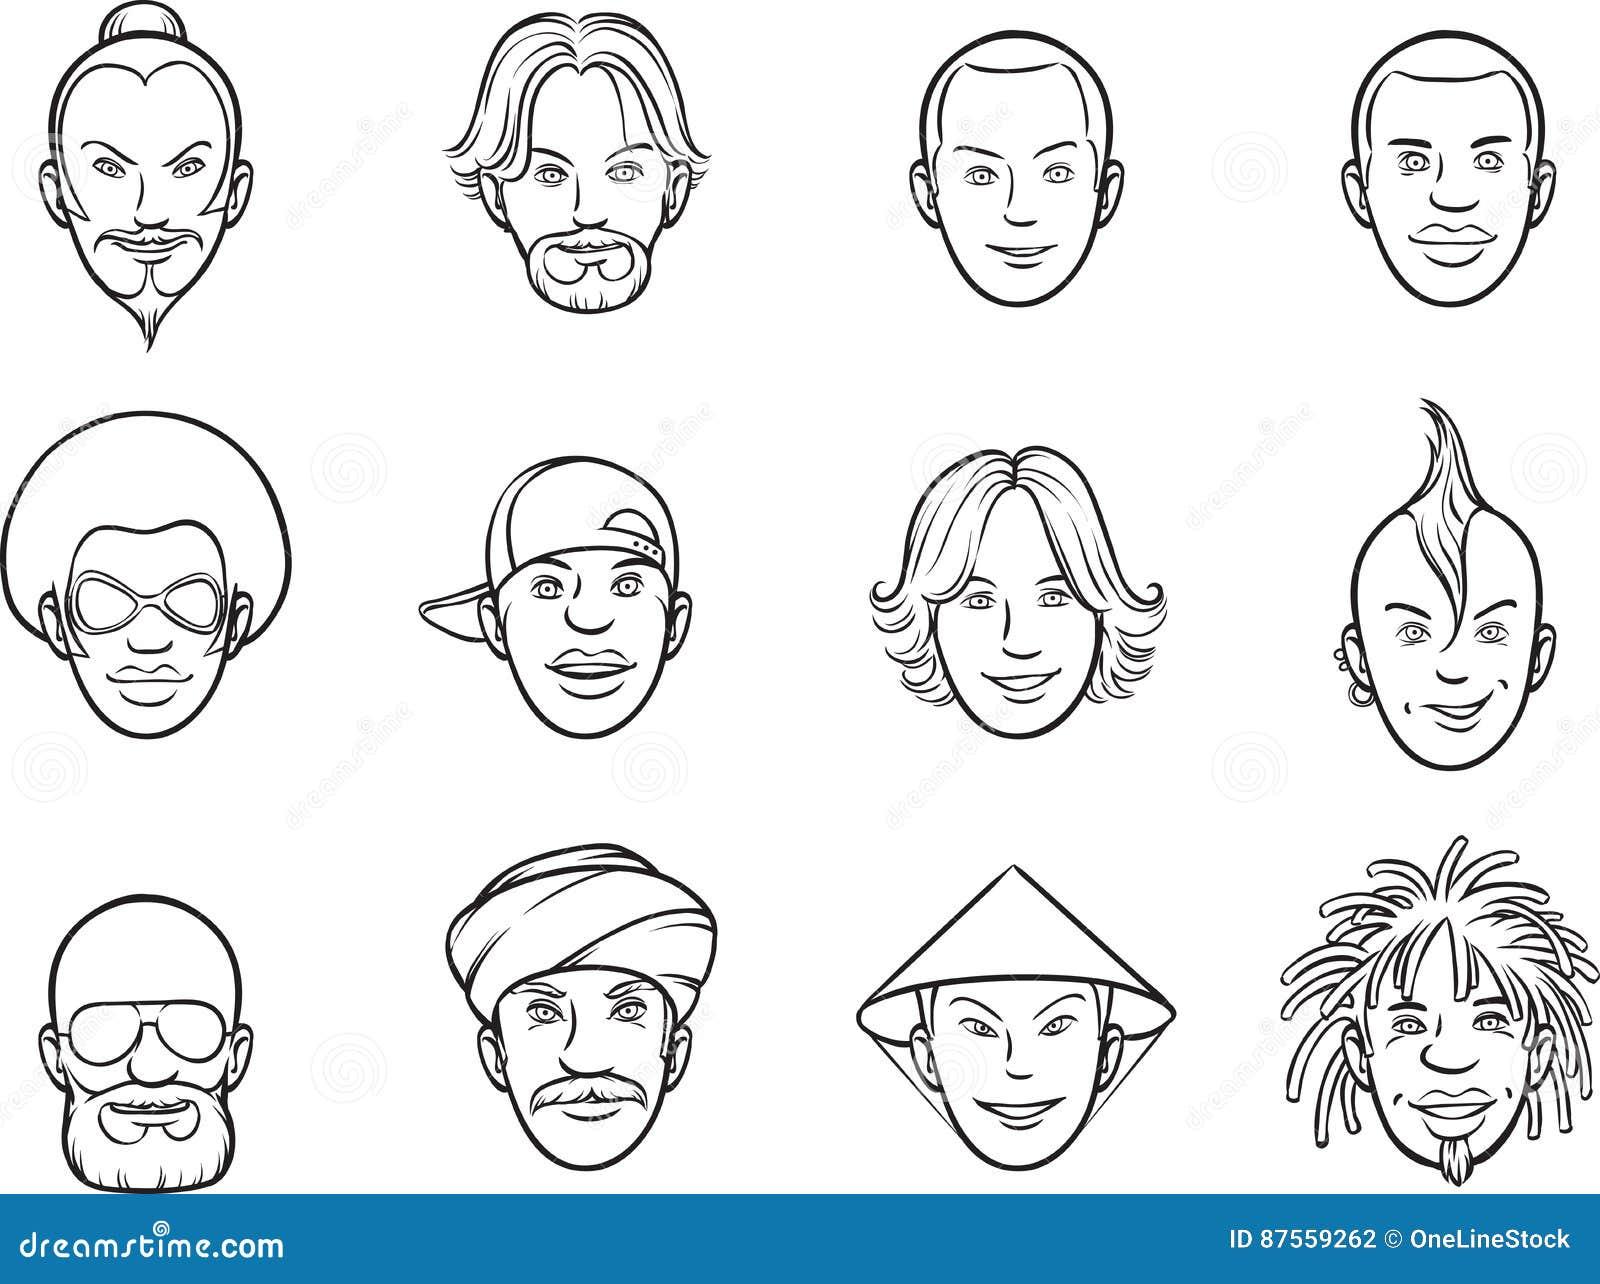 Dibujo De Whiteboard - Caras Del Excéntrico Del Avatar De La ...